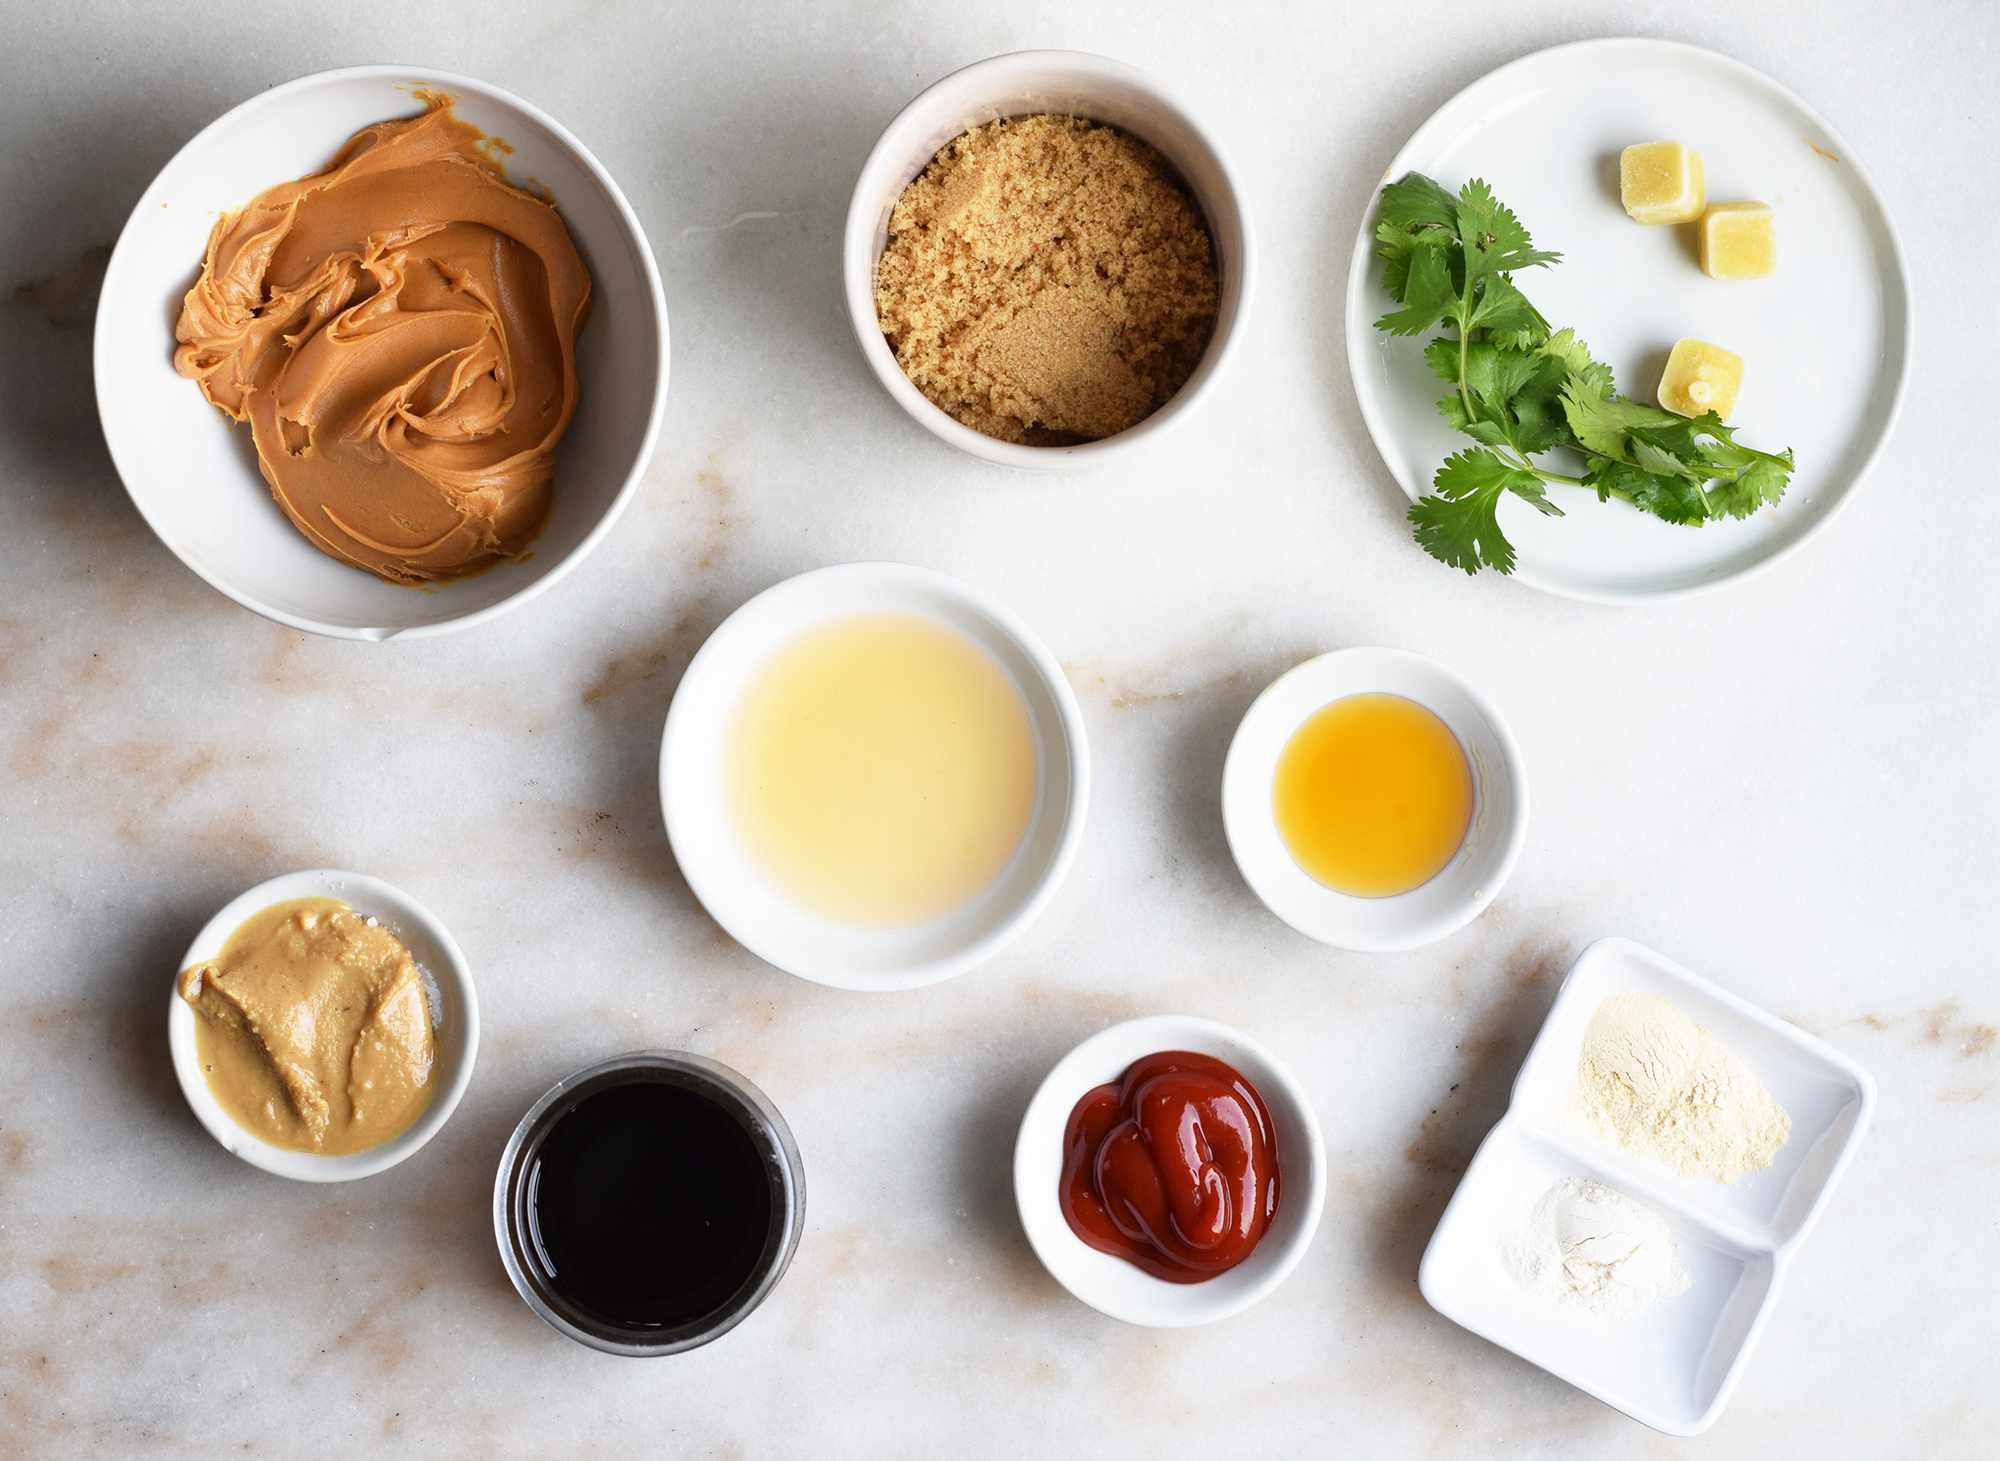 ingredients for peanut tahini dressing